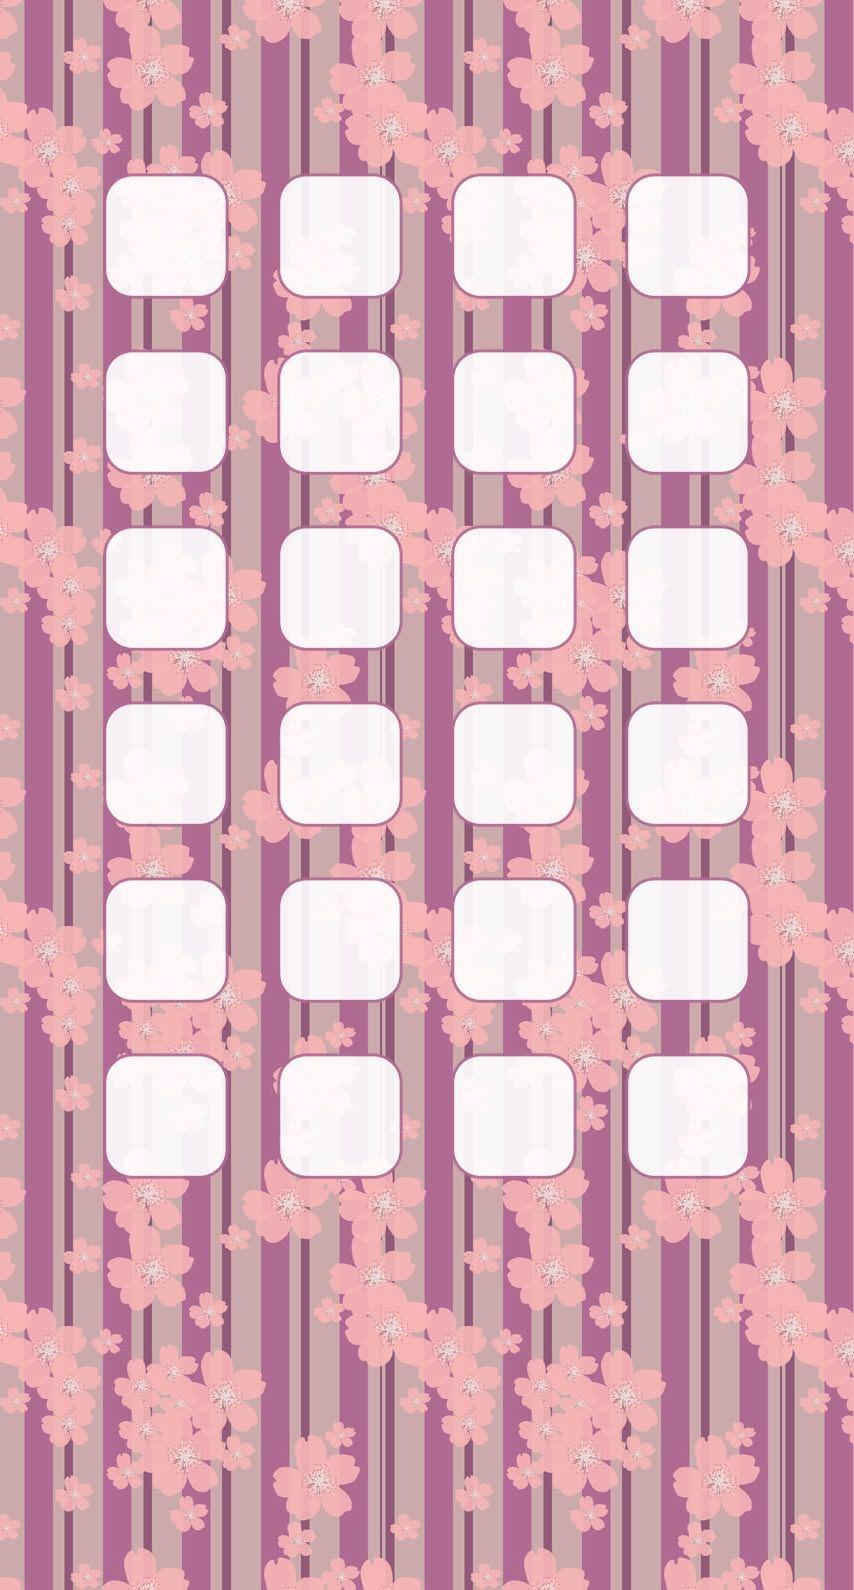 100 Wallpaper Iphone 6s Sakura Hinhanhsieudep Net